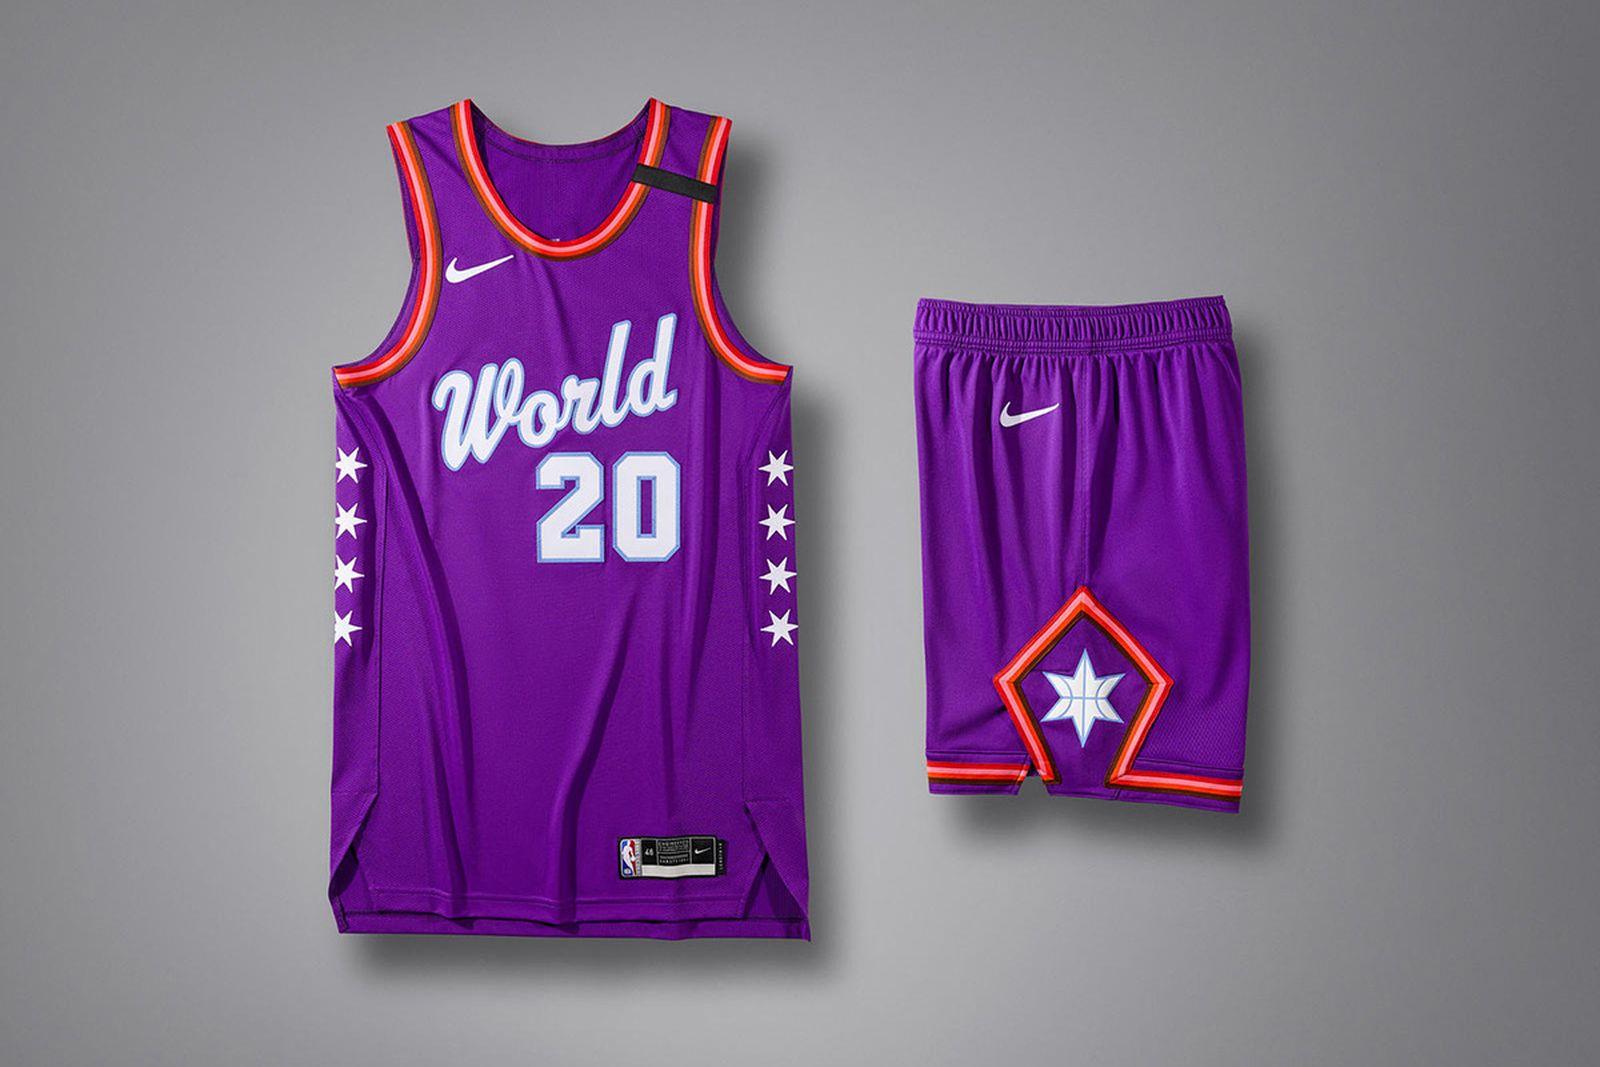 jordan-brand-nba-star-game-uniforms-06